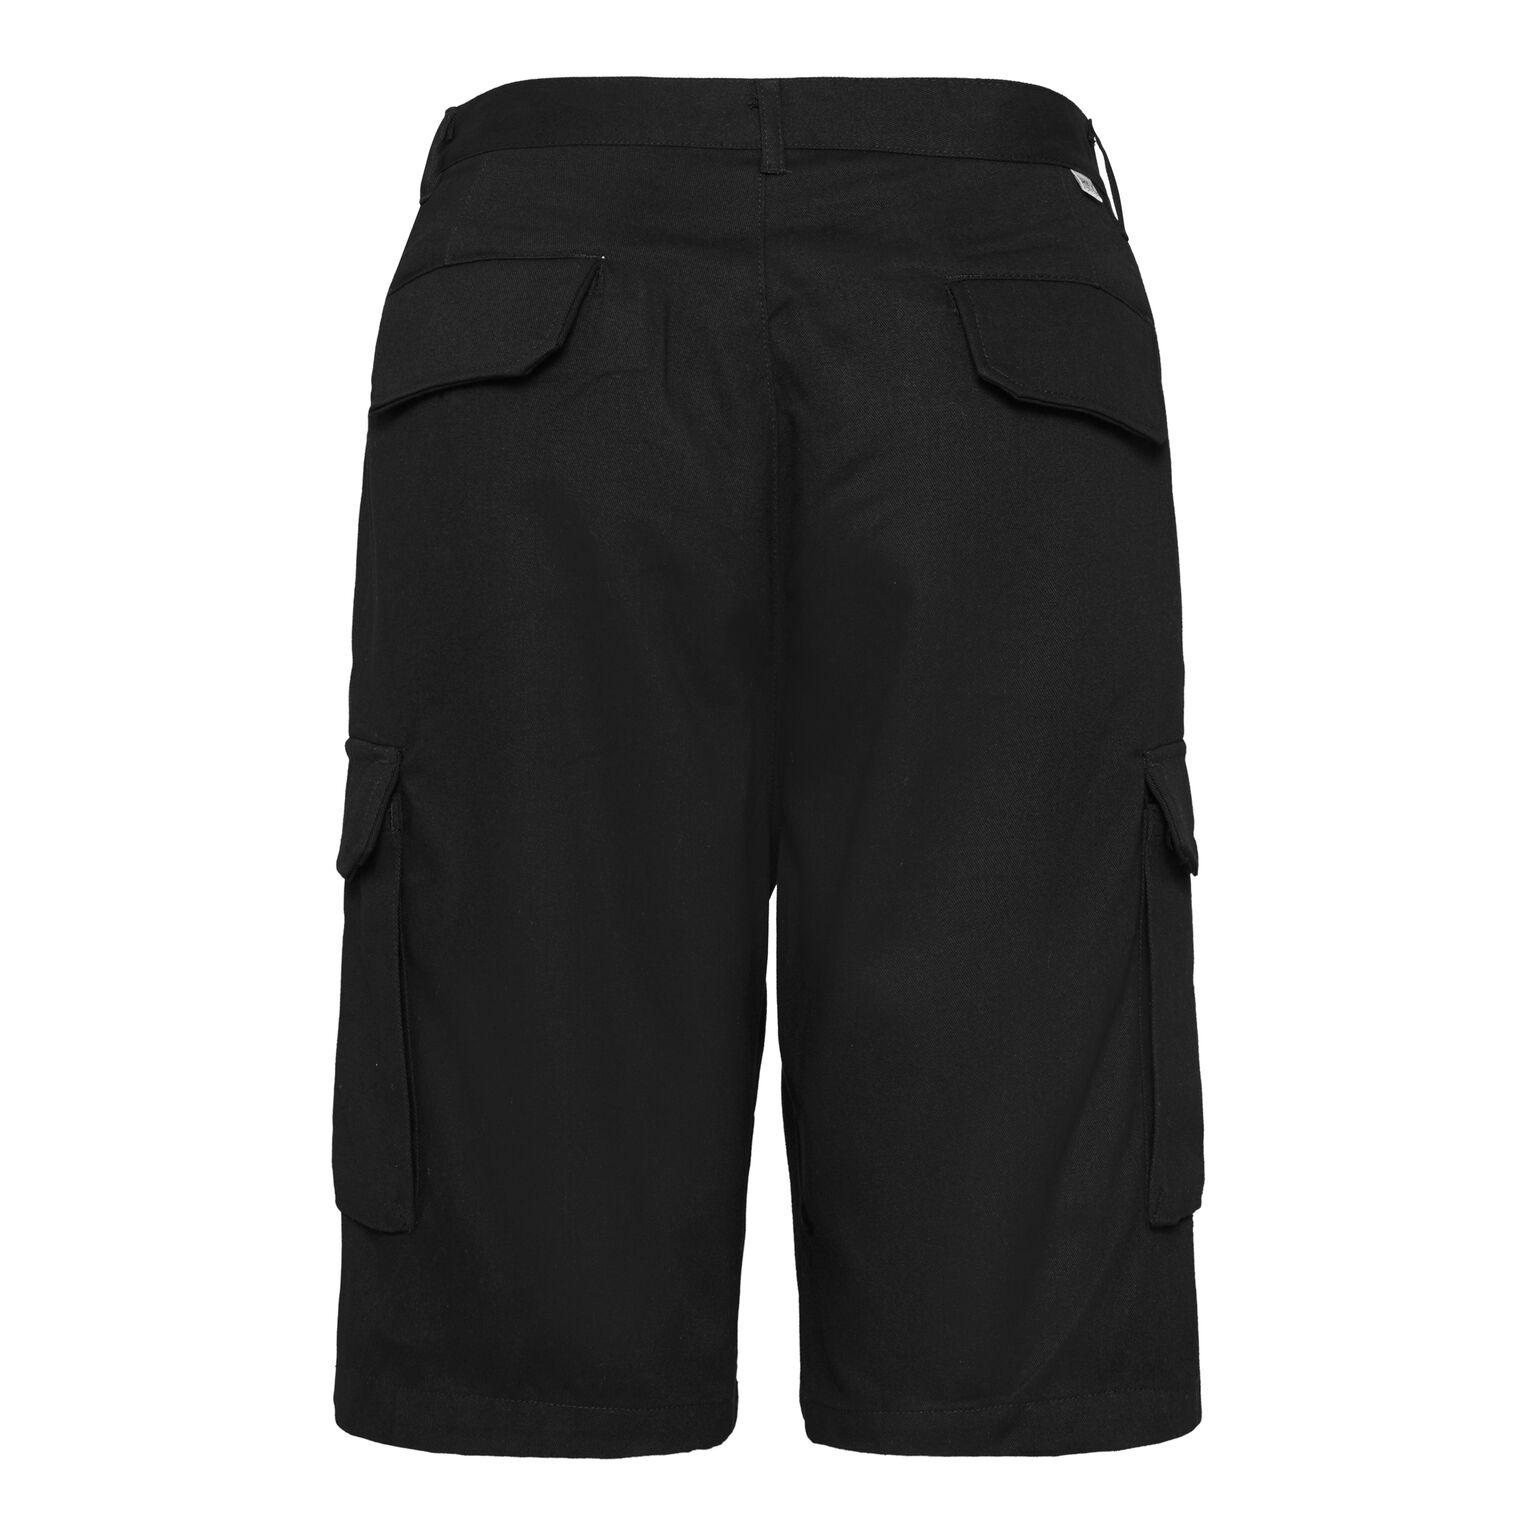 Rty Workwear Mens Polycotton Cargo Shorts